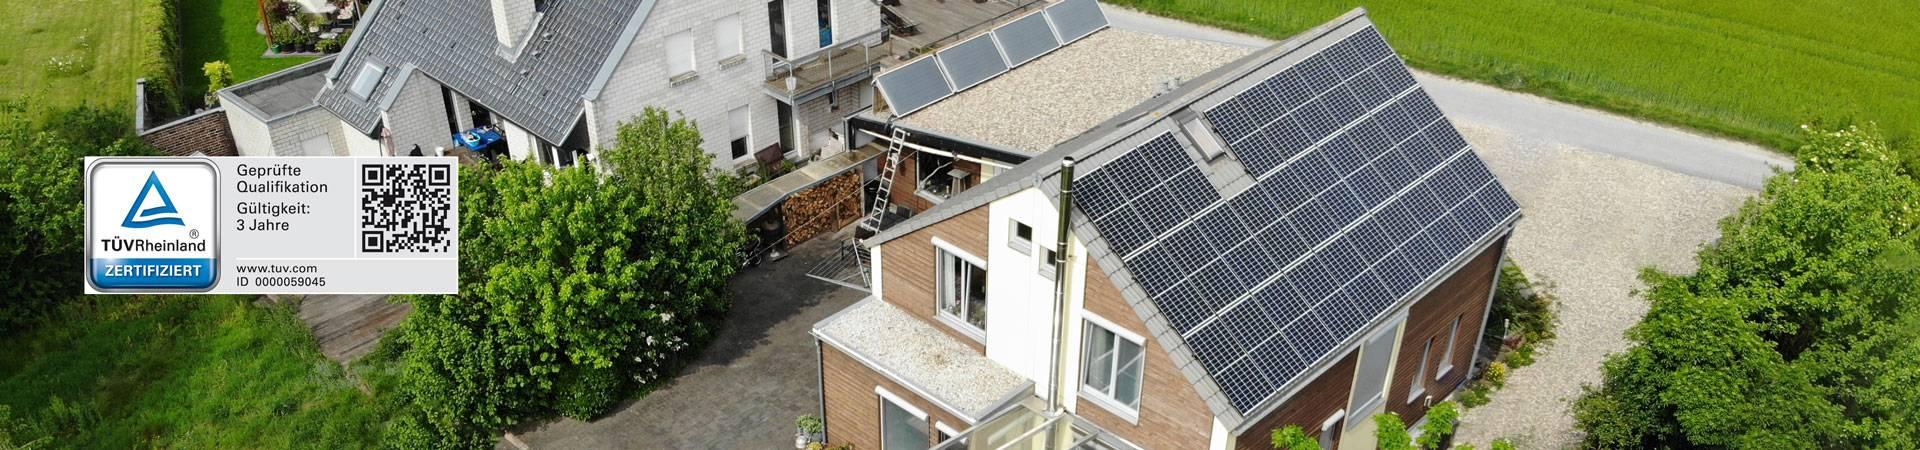 photovoltaik düsseldorf